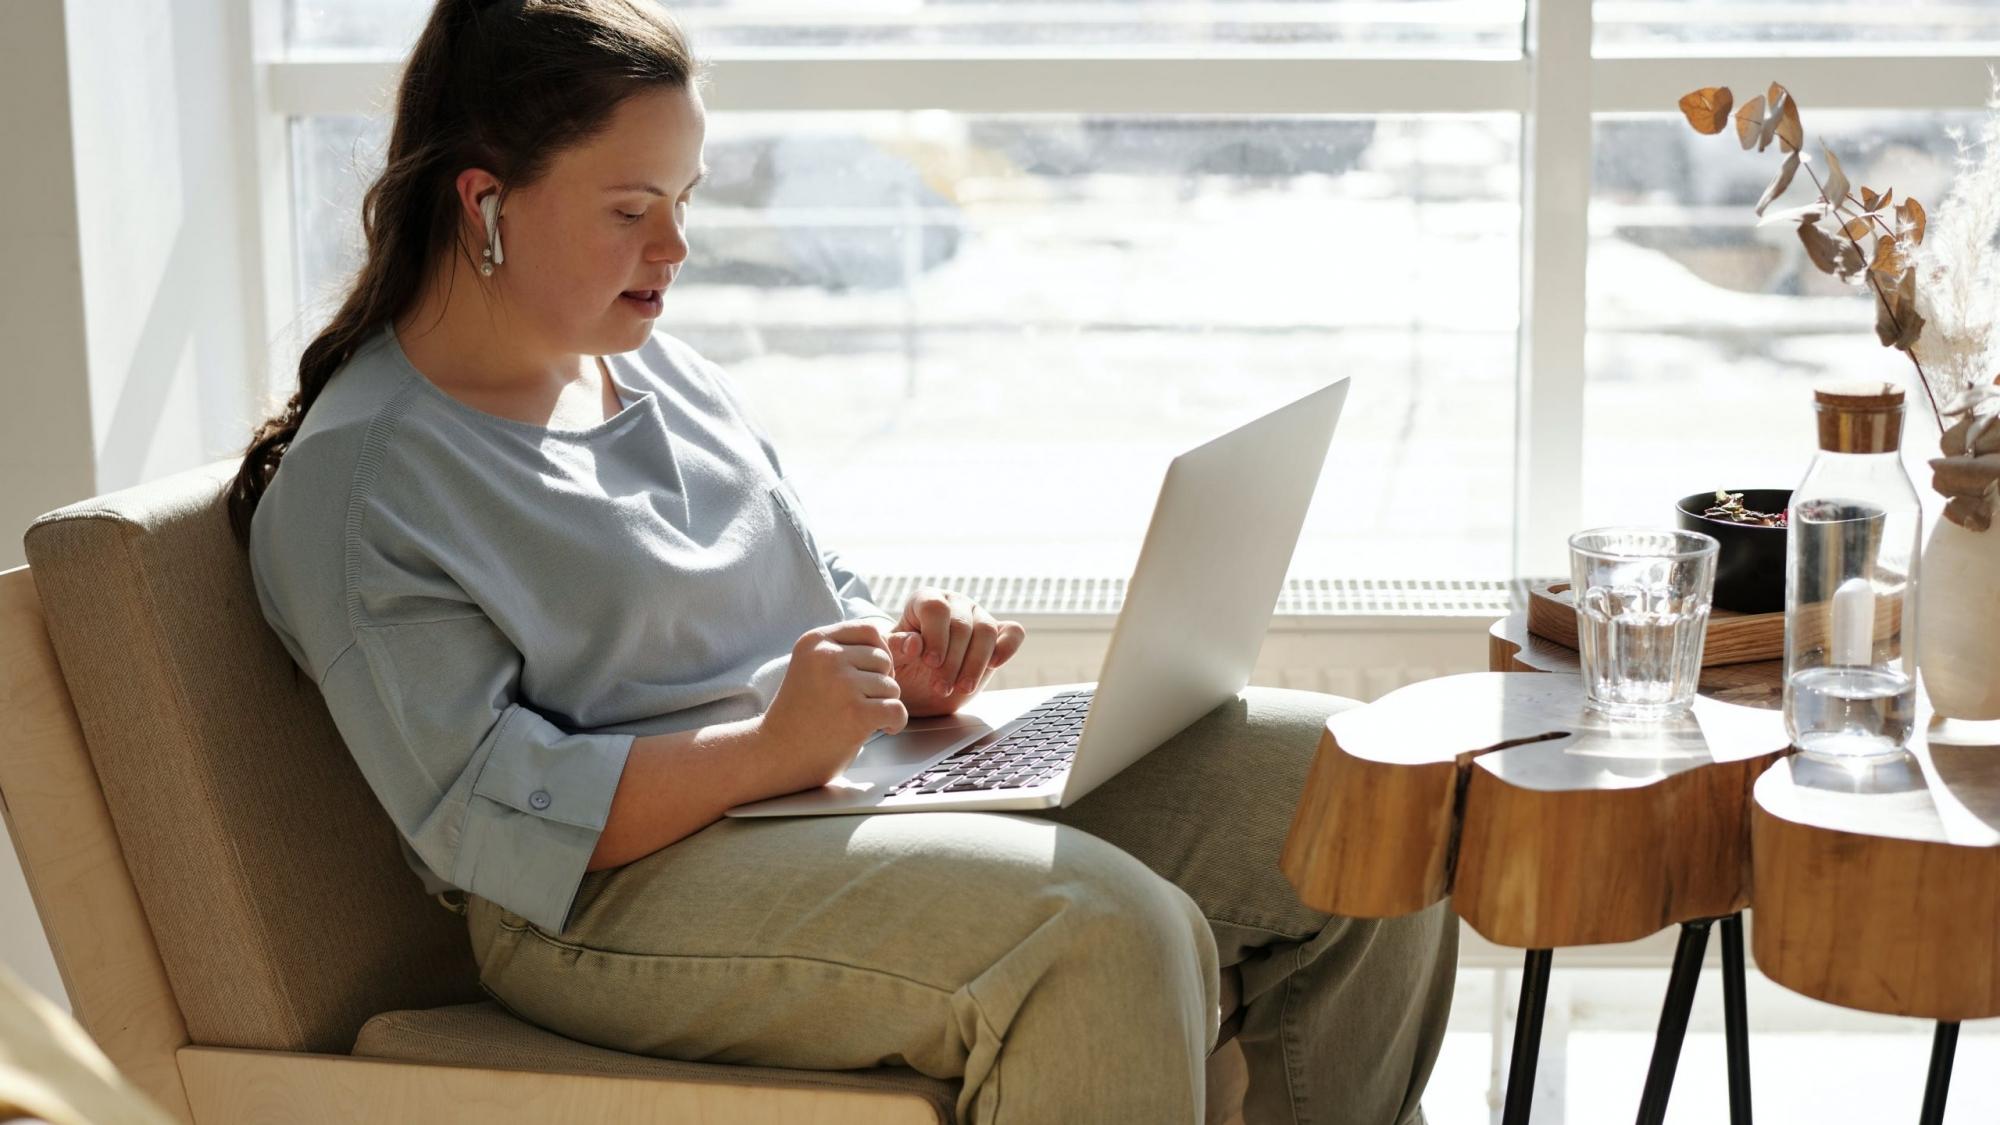 Mädchen mit Downsyndorm an Laptop